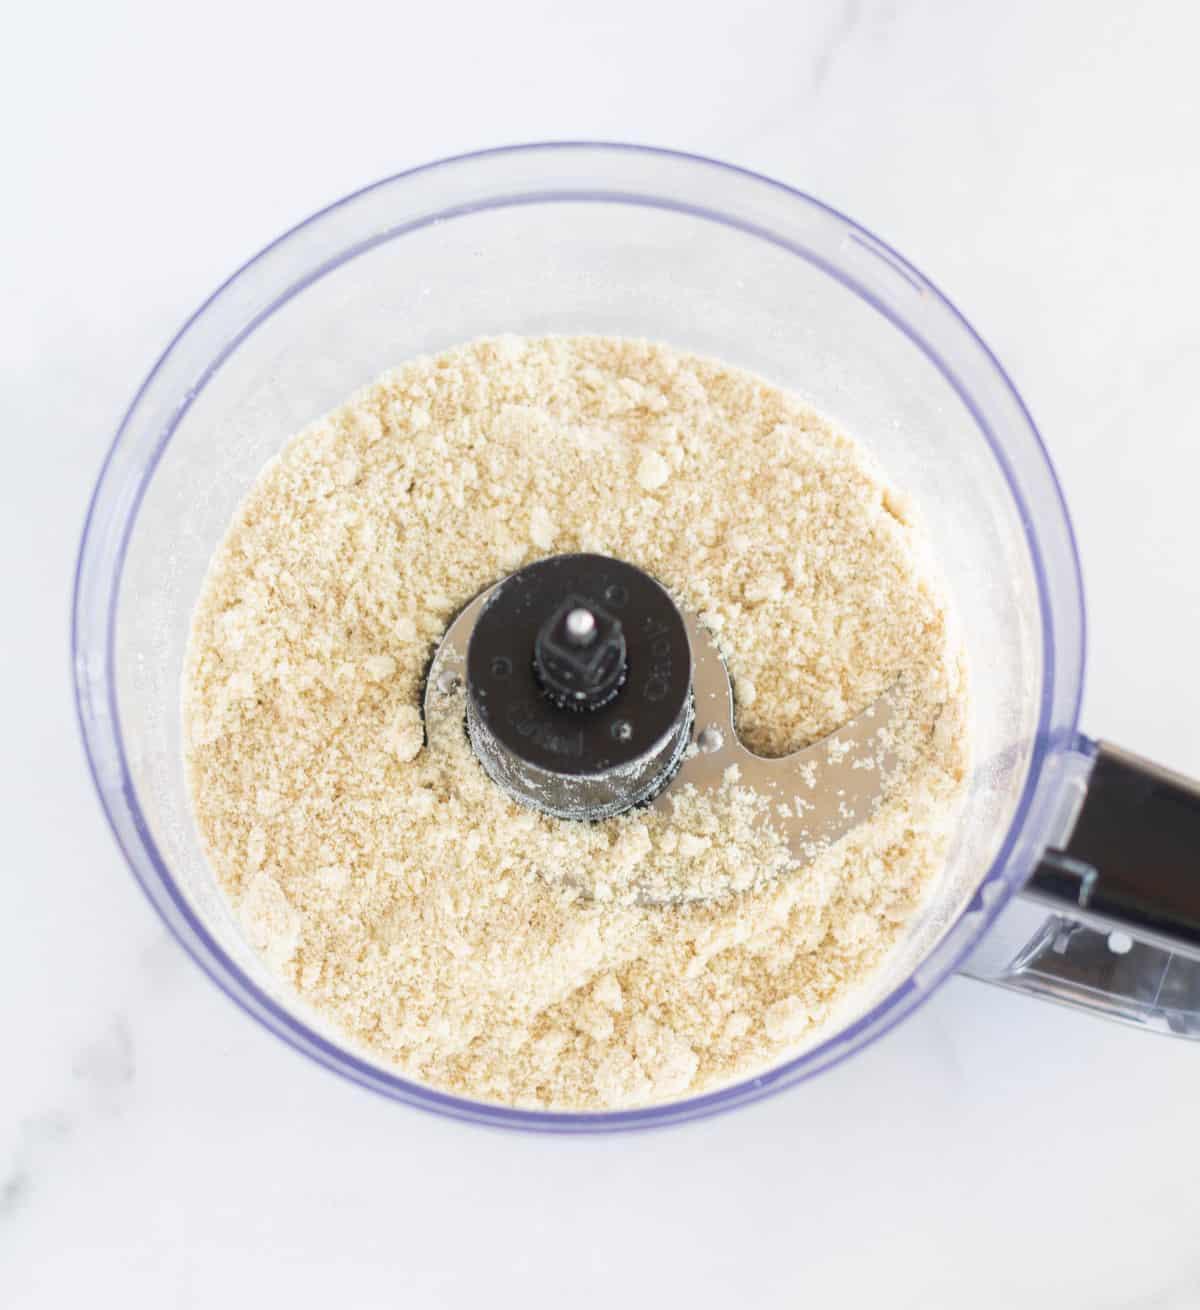 dry ingredients in bowl of food processor